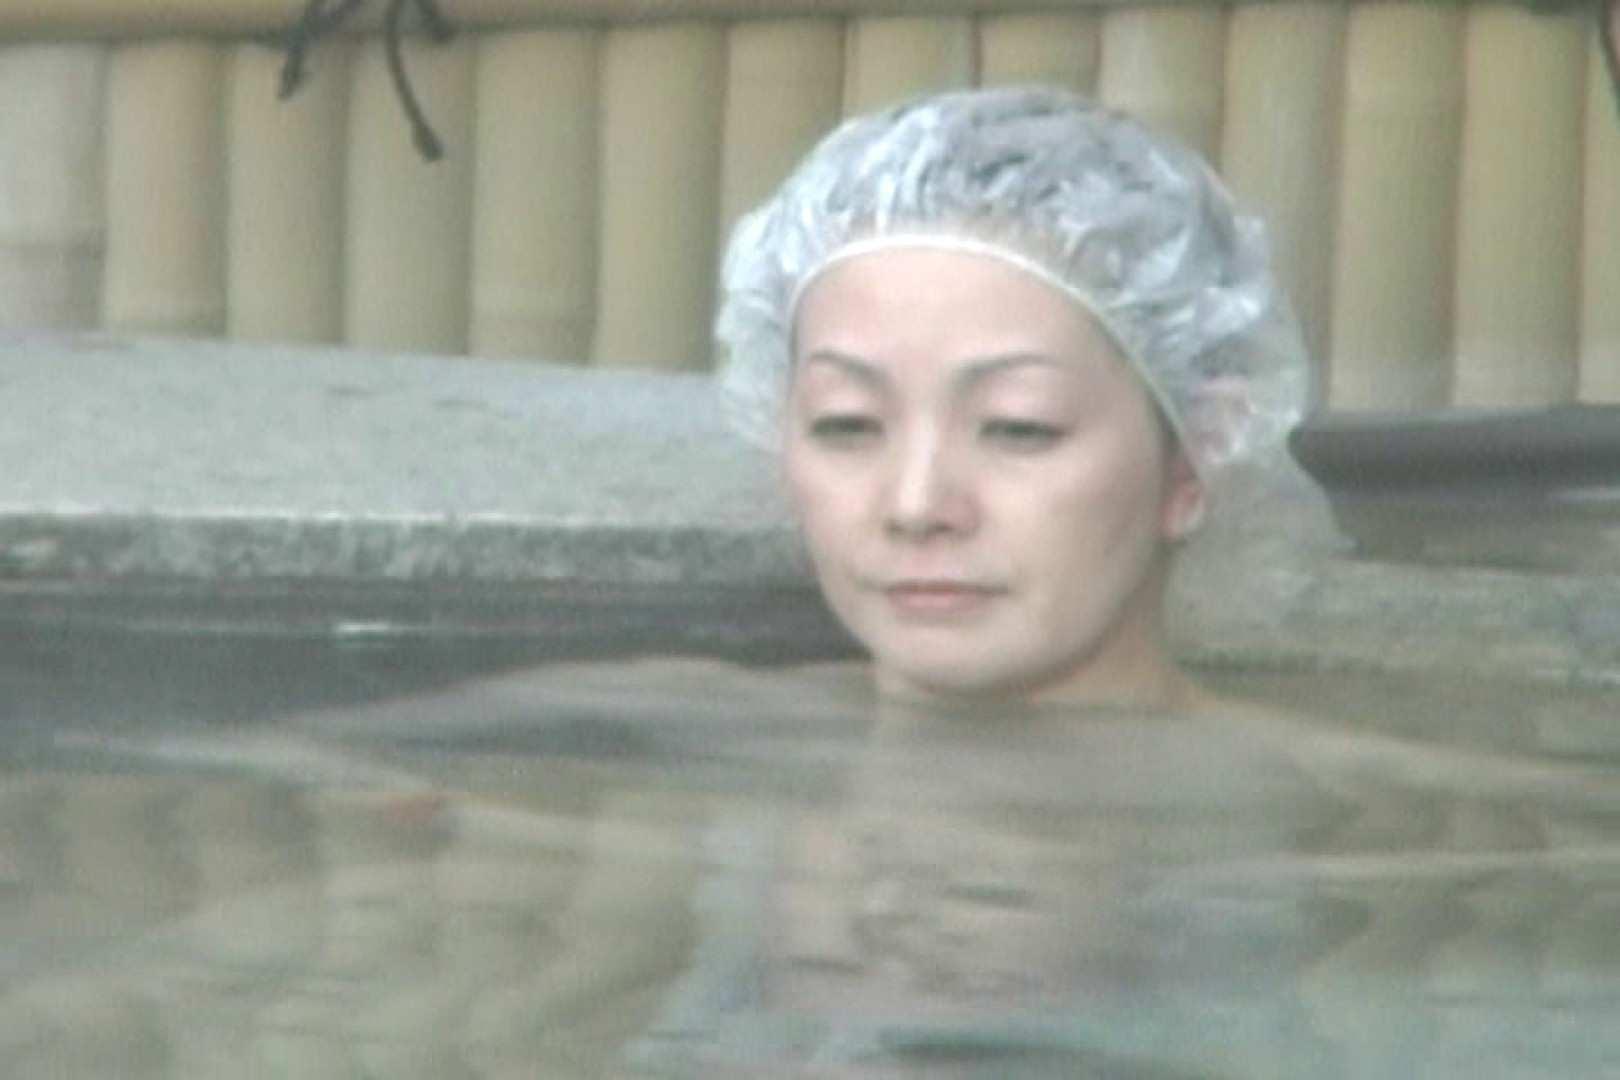 Aquaな露天風呂Vol.592 盗撮特撮 おまんこ動画流出 12pic 11